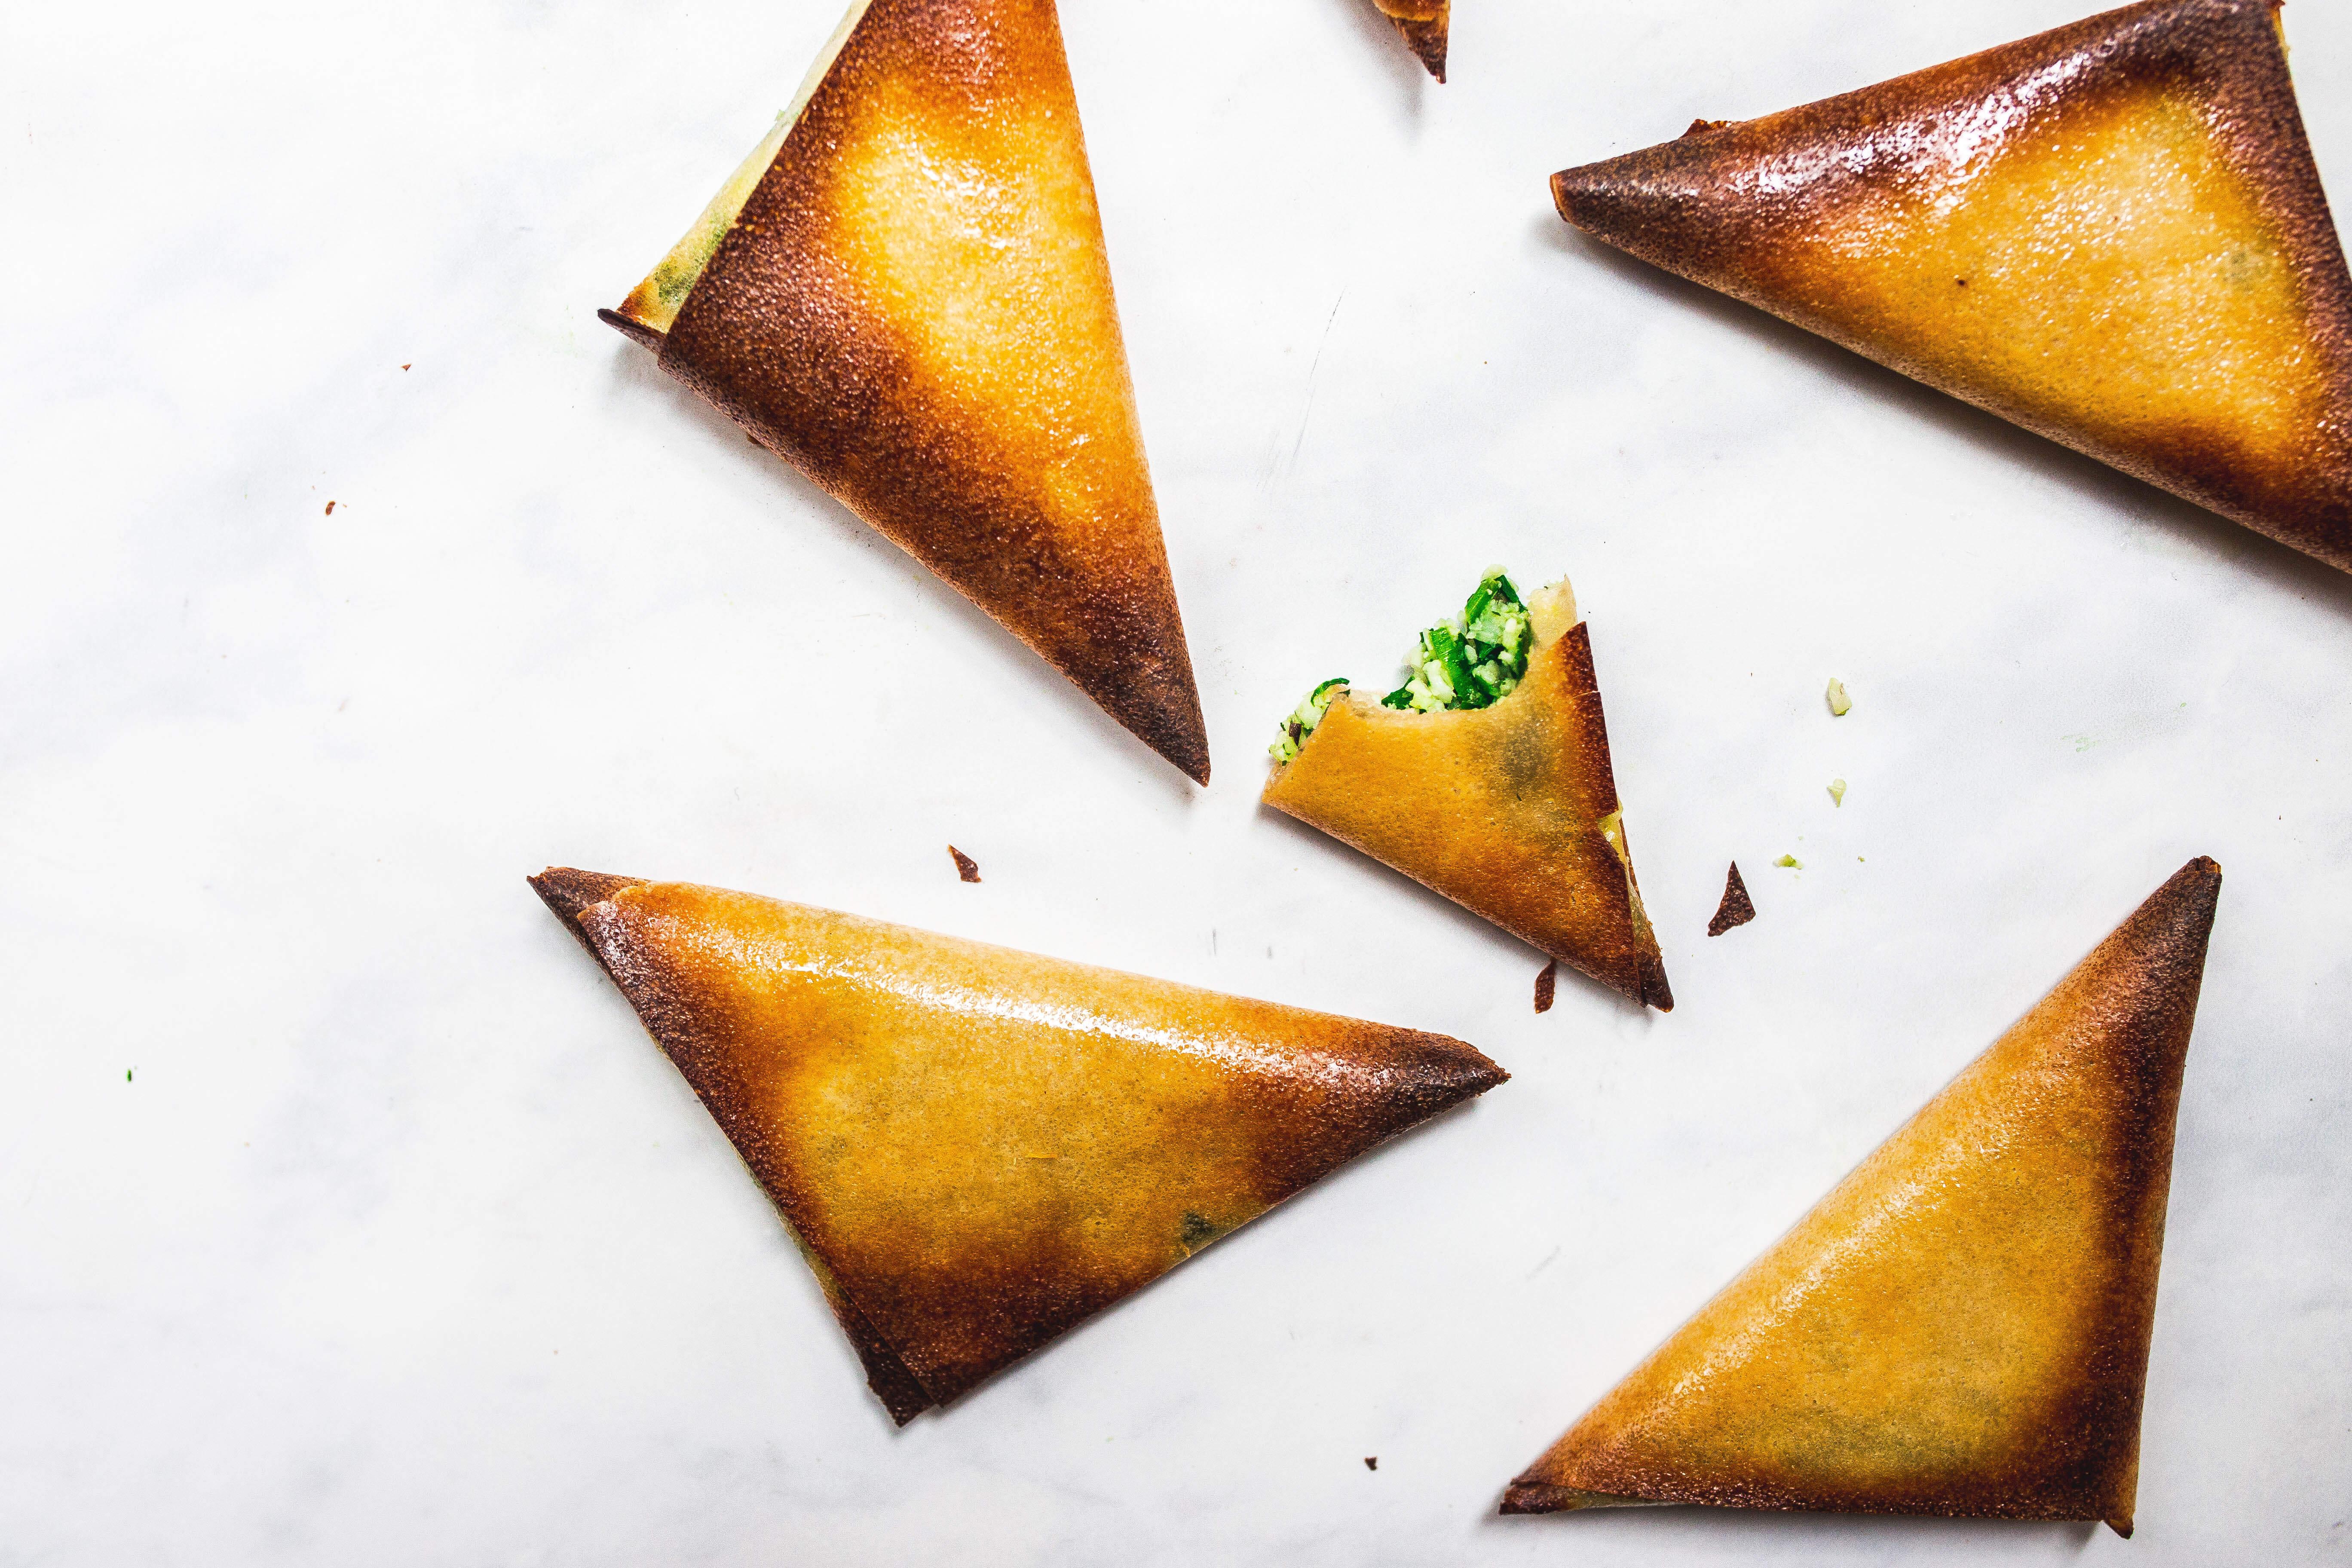 Paleo Greek Spinach Pie via Food by Mars (gluten-free, low-carb, grain-free, dairy-free, AIP)